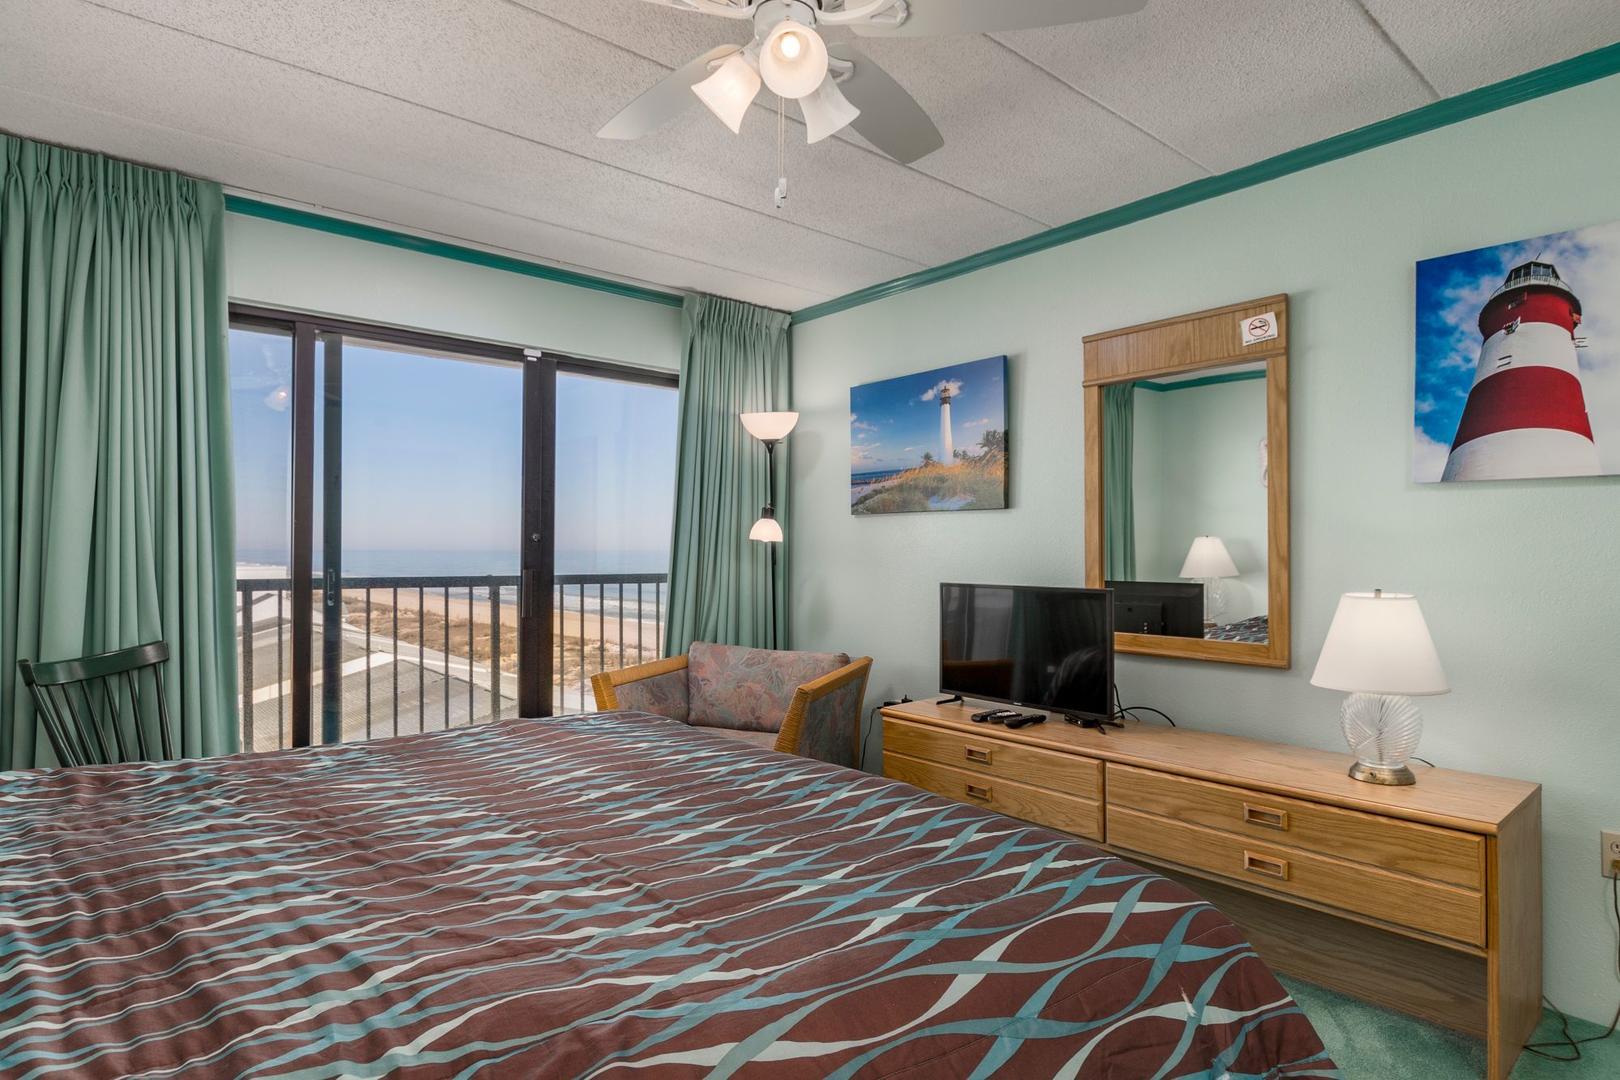 Summer Beach 605 - Bedroom 1